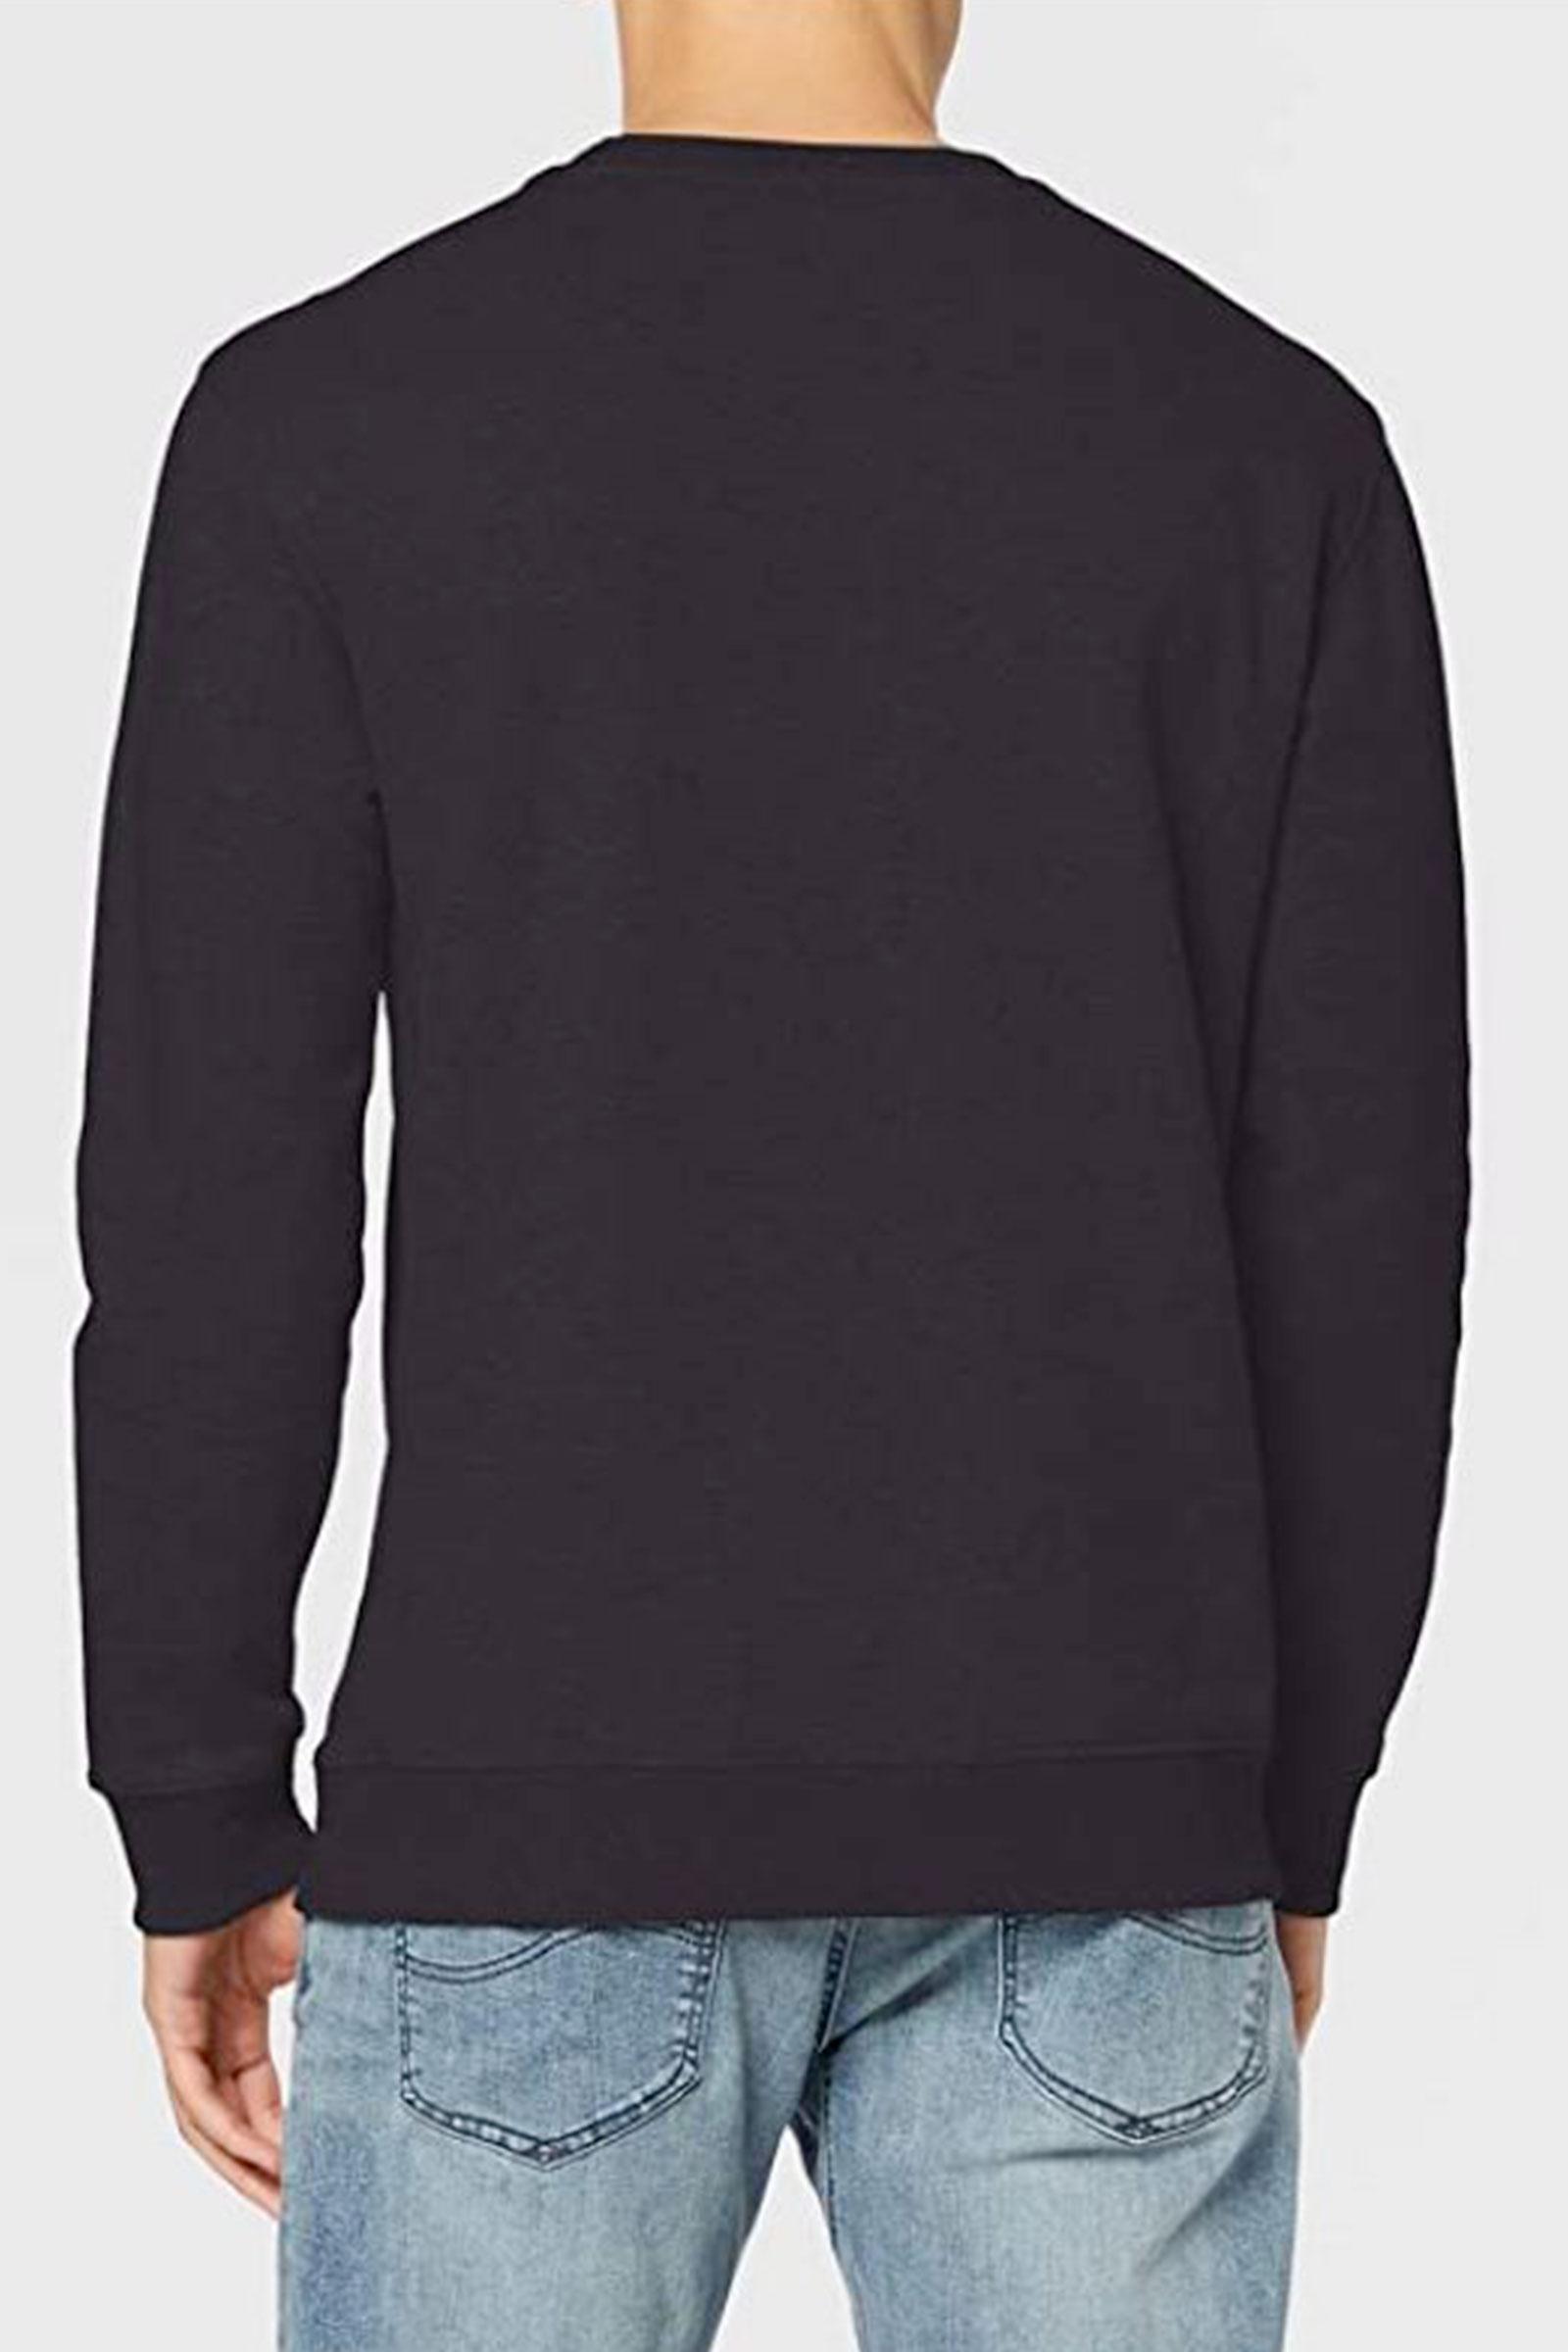 LEE Men's Sweatshirt Model PLAIN CREW SWS LEE   Sweatshirt   L81ITJ01